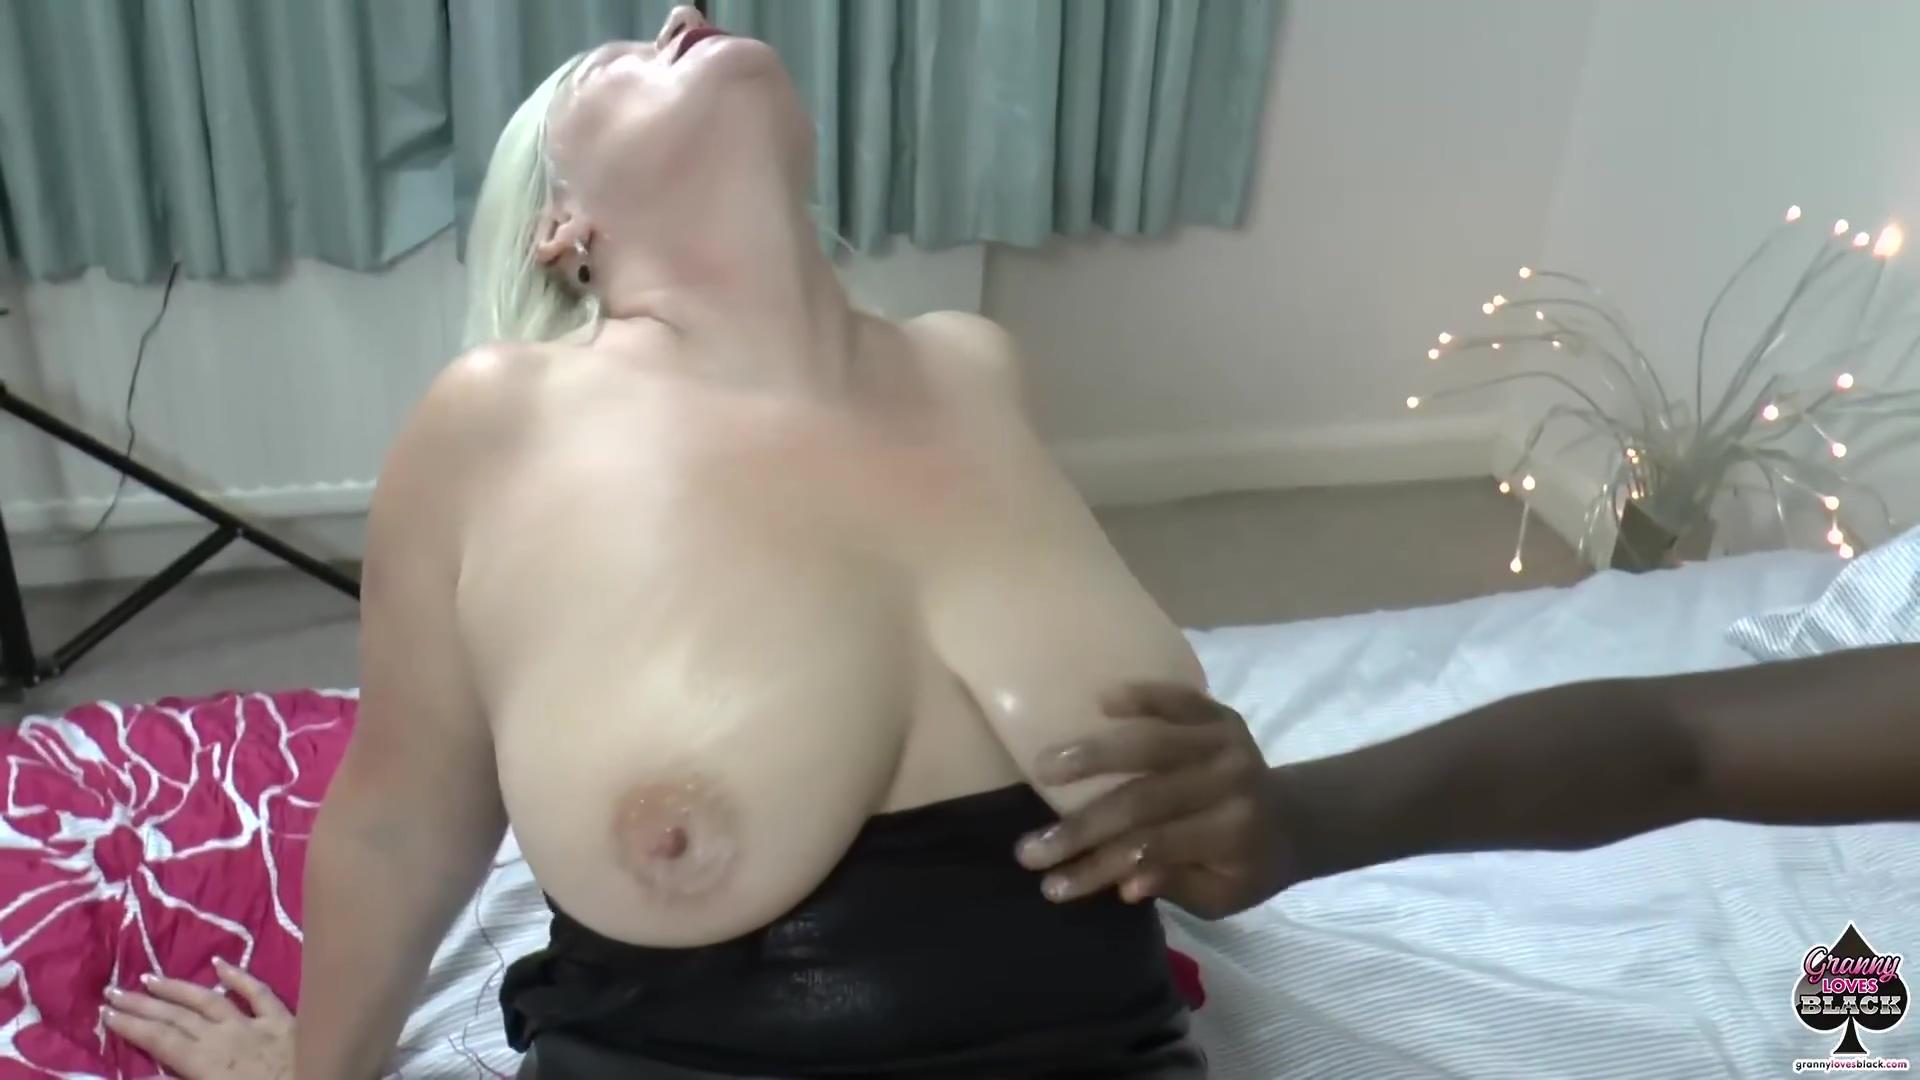 Video 1500365304: bbw foot fetish, interracial foot fetish, milf foot fetish, big tit bbw granny, foot fetish cock, gilf feet, bbw mature granny, british foot fetish, blonde bbw granny, foot fetish hd, feet wanking